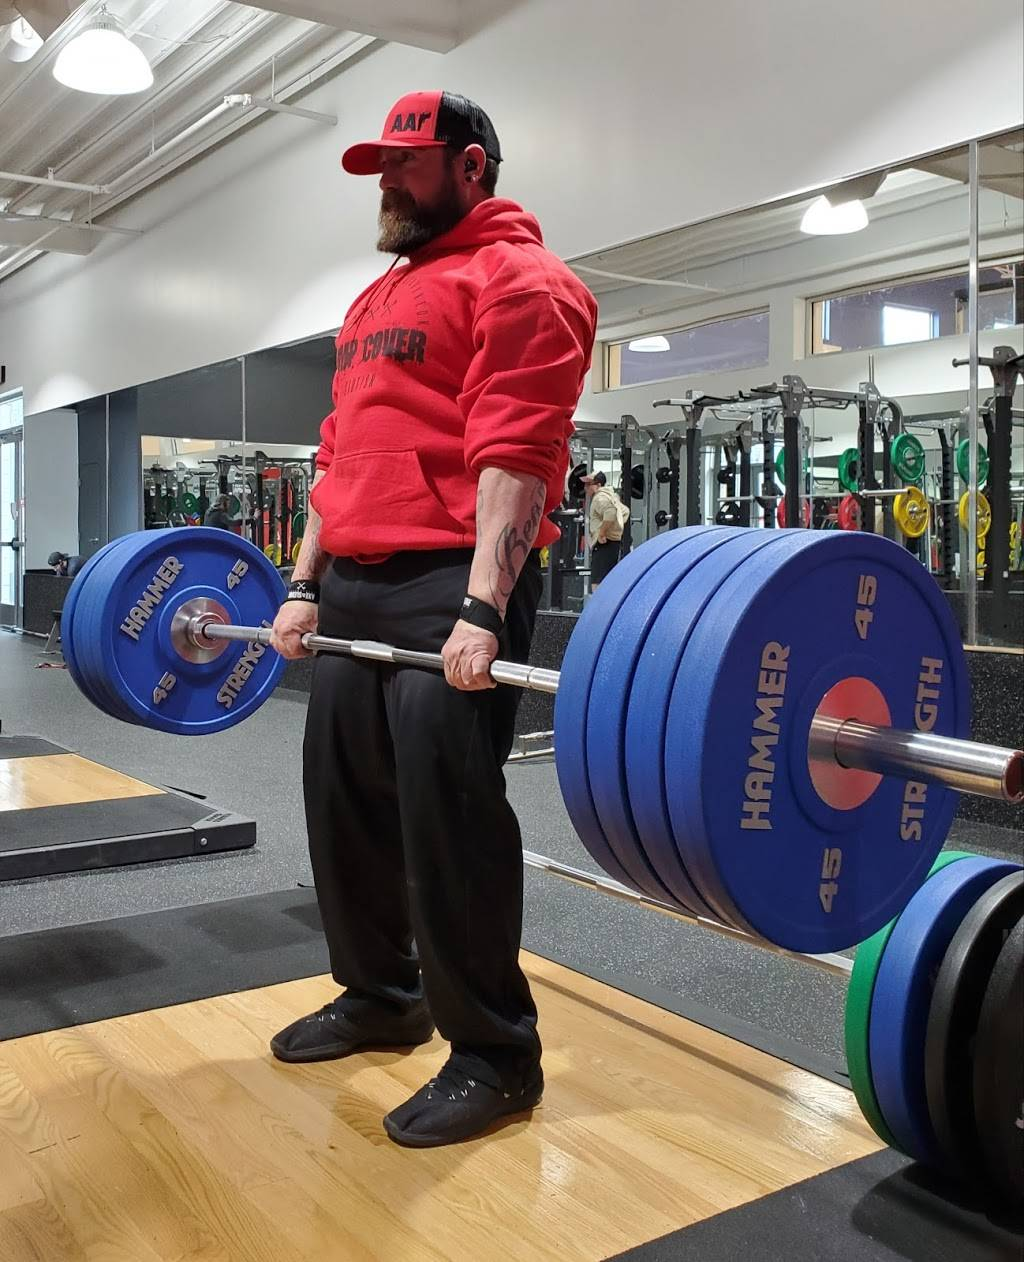 VASA Fitness - gym    Photo 3 of 7   Address: 15200 E Colfax Ave, Aurora, CO 80011, USA   Phone: (719) 294-6630